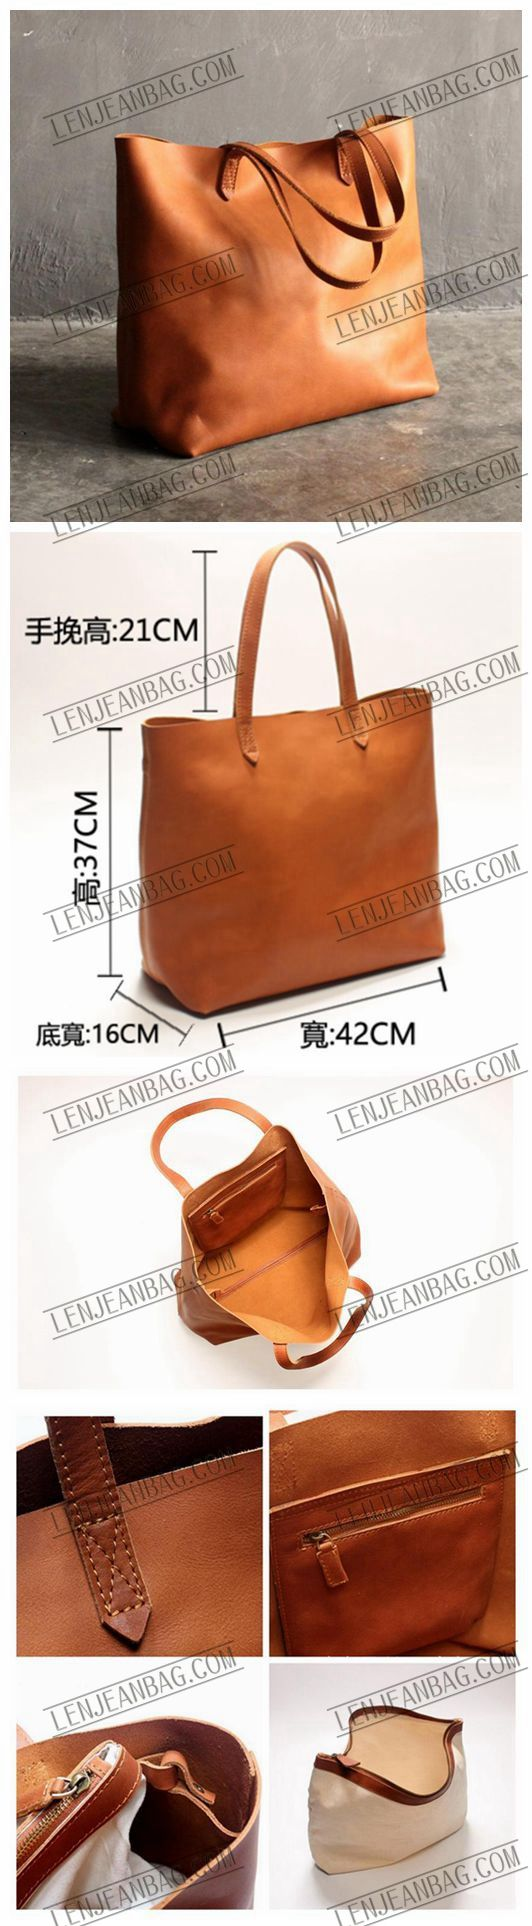 Handmade Women Tote Bag for Shopping, Women Shoulder Bag, Working Bag SL002